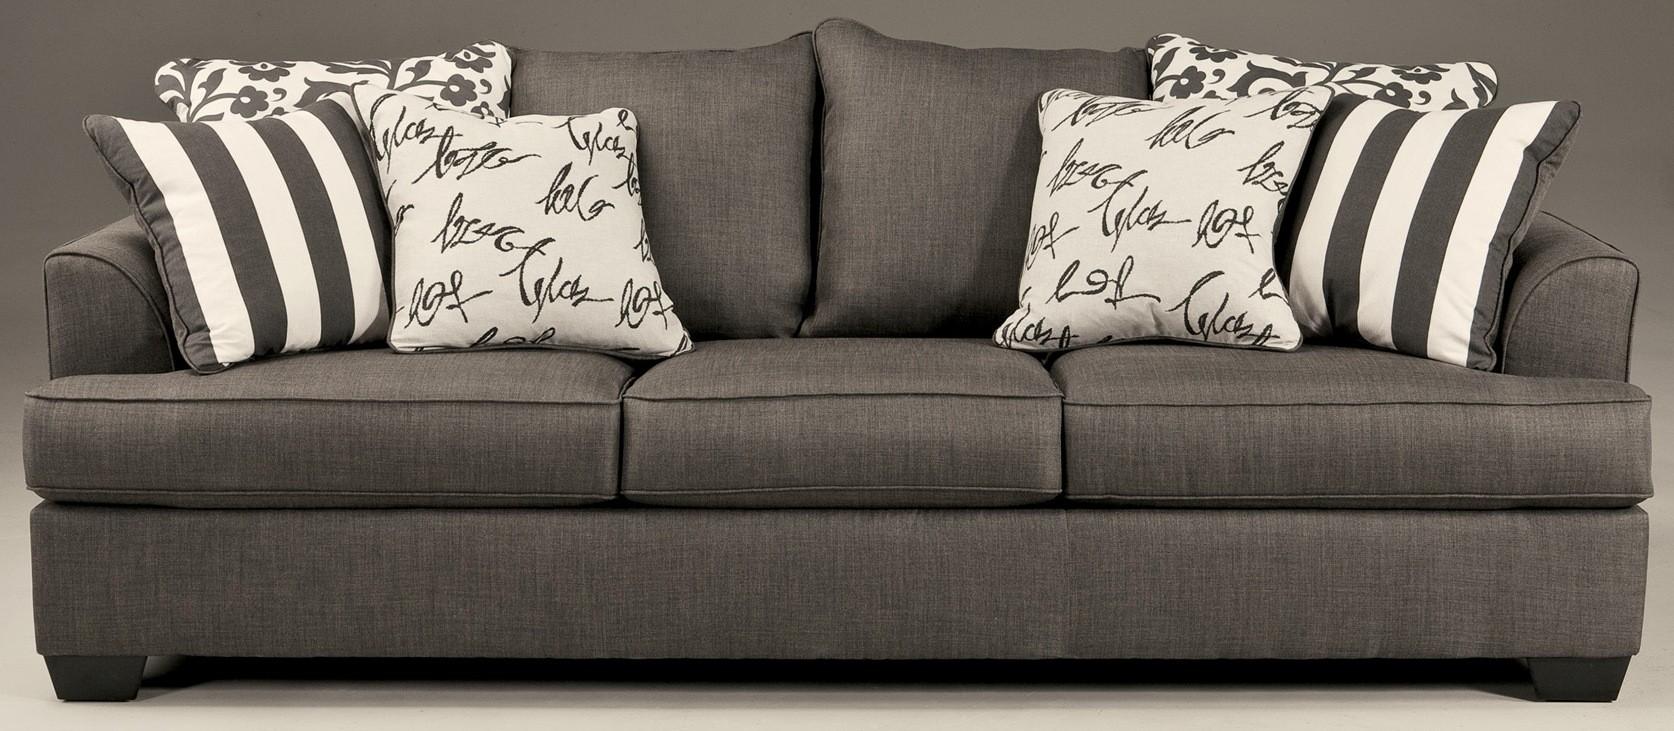 Levon Charcoal Stationary Sofa From Ashley 7340338